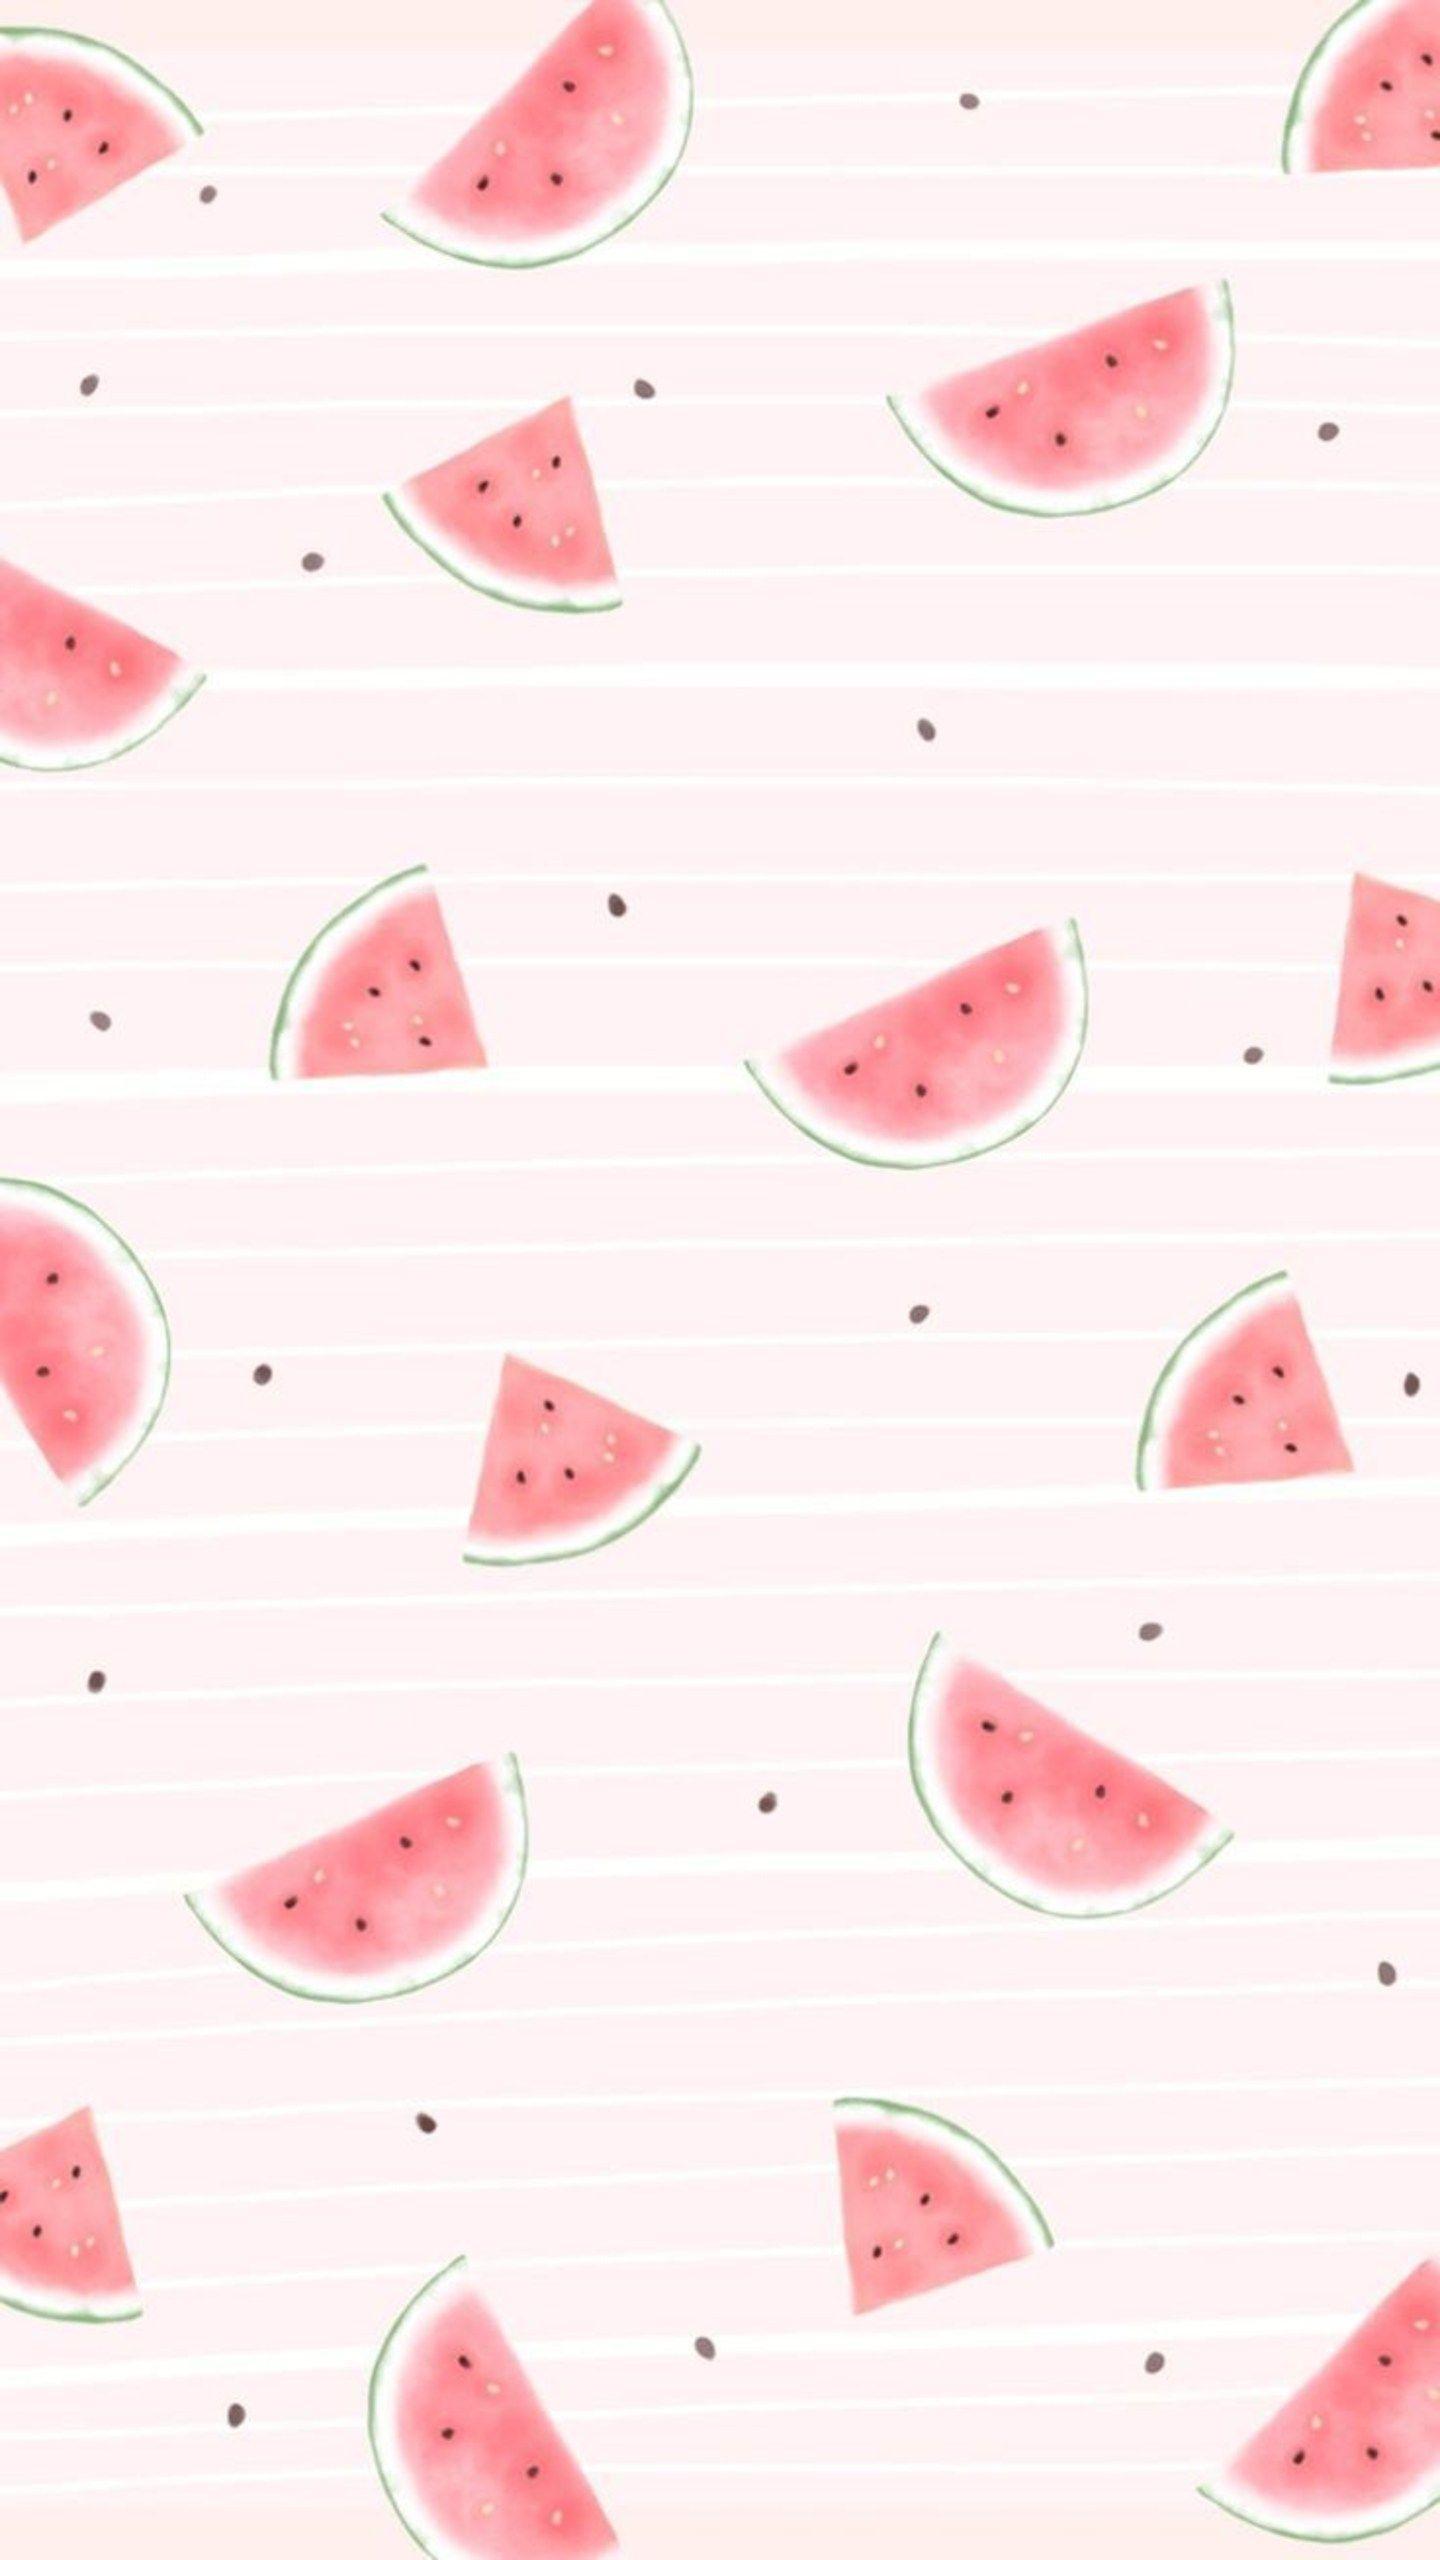 Pink Skin Pattern Watermelon Design Pretty Wallpaper Iphone Cute Patterns Wallpaper Download Cute Wallpapers